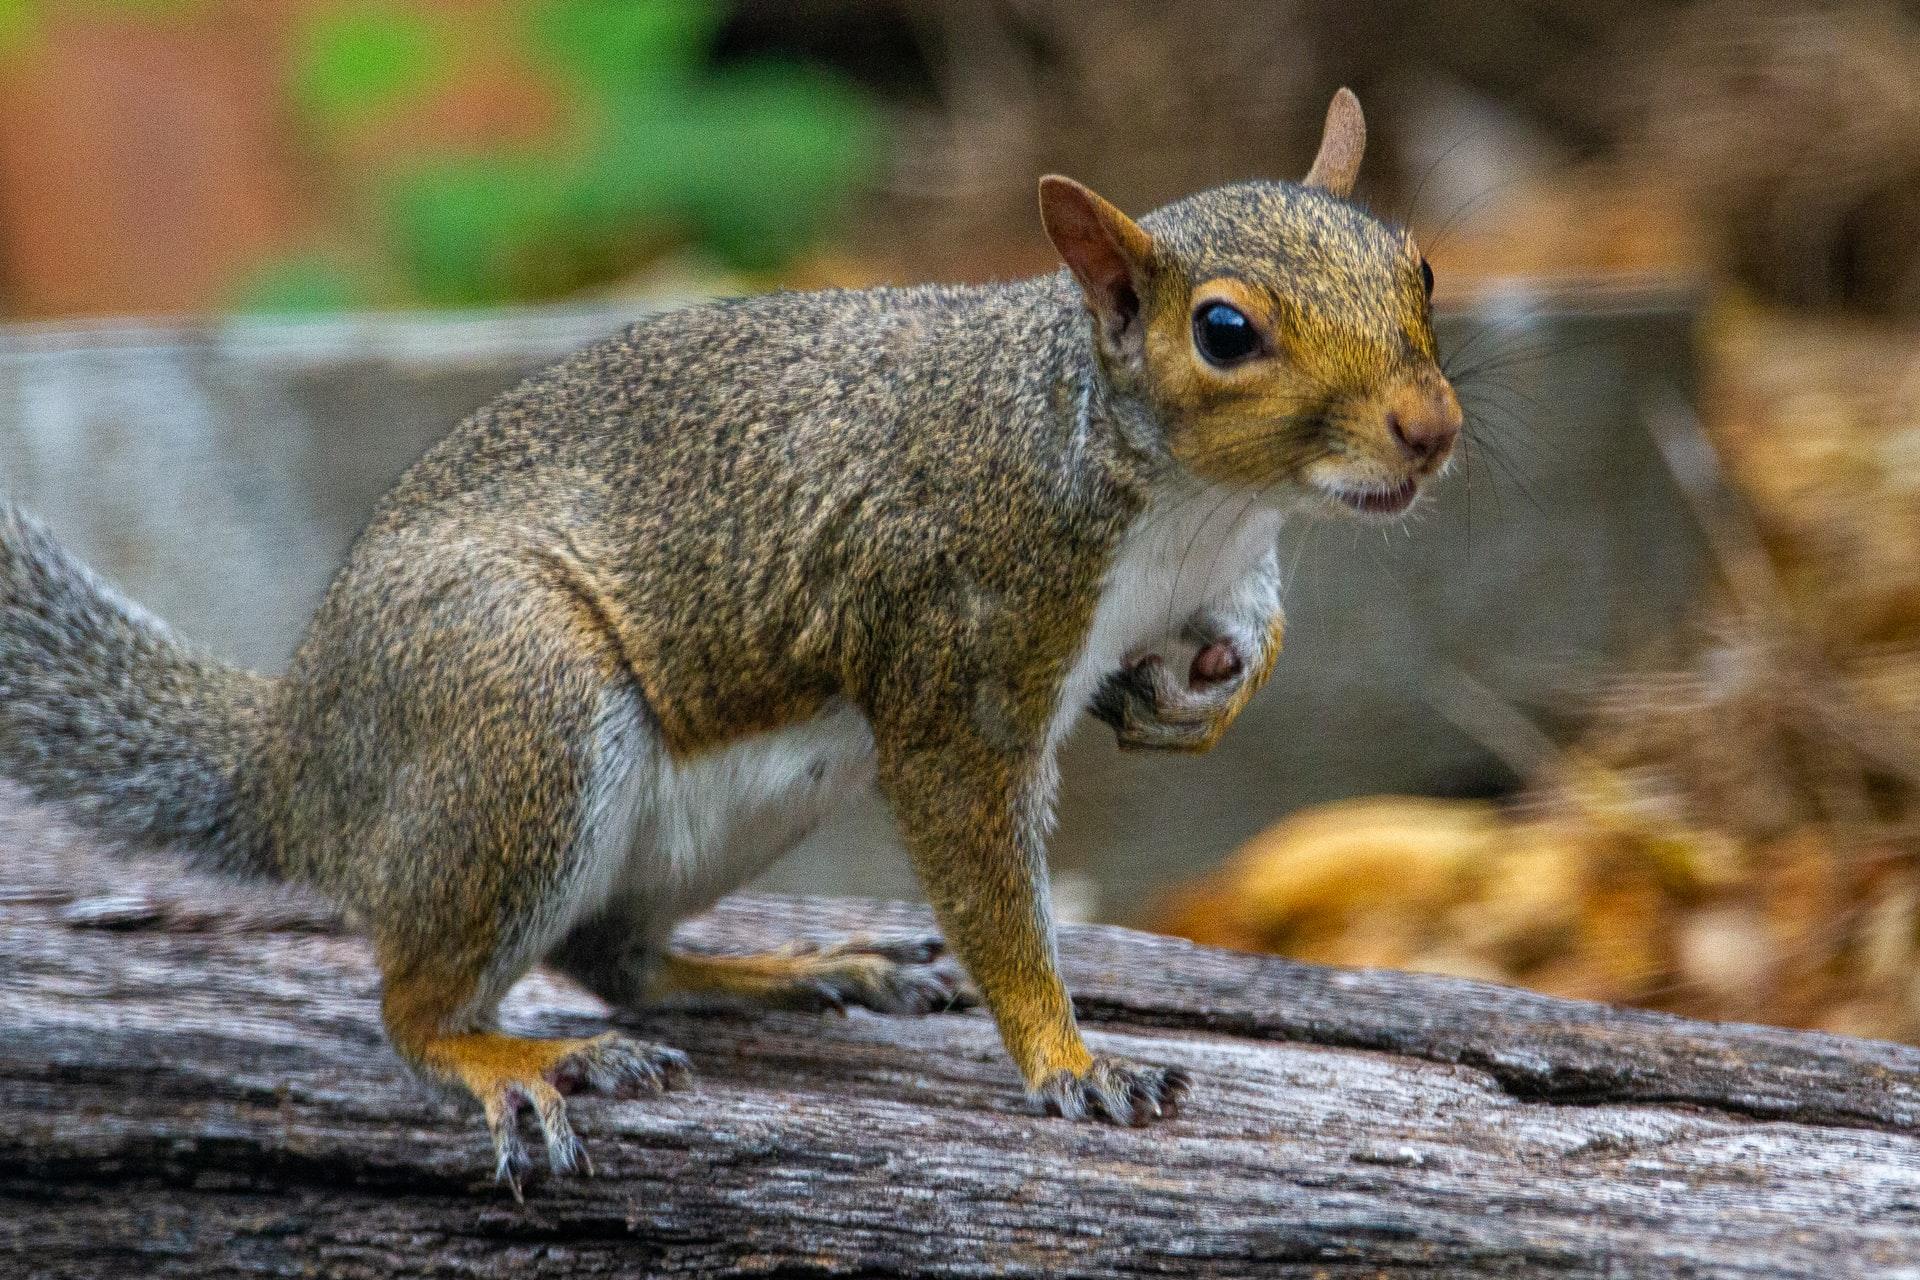 gry squirrel joshua-j-cotten